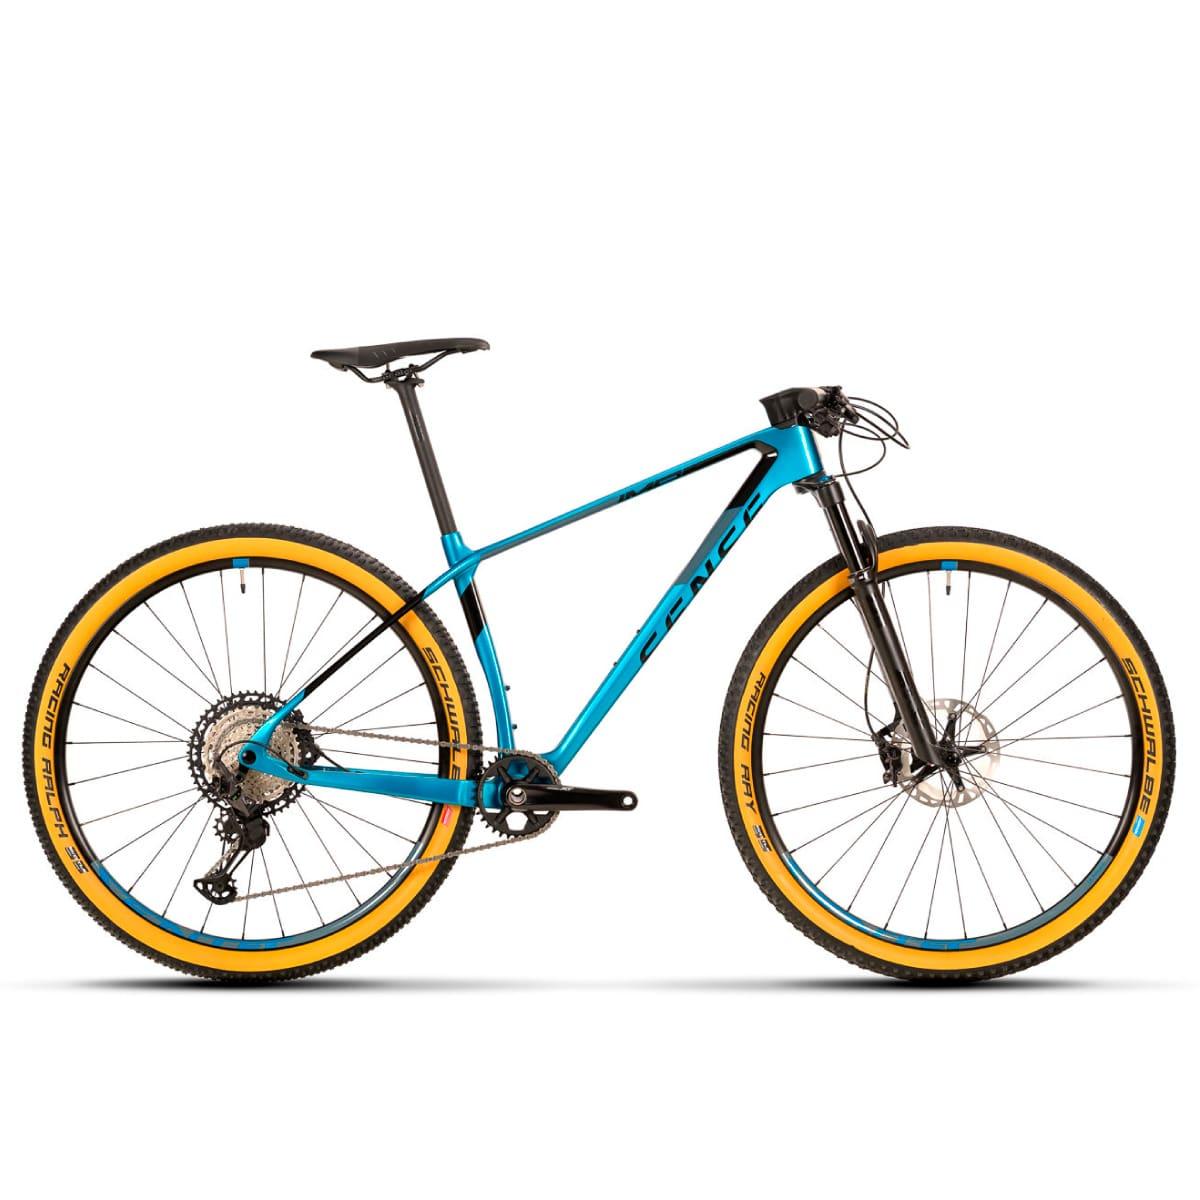 Bike Sense Impact Carbon Evo 2020 Aro 29 Shimano XT 12V